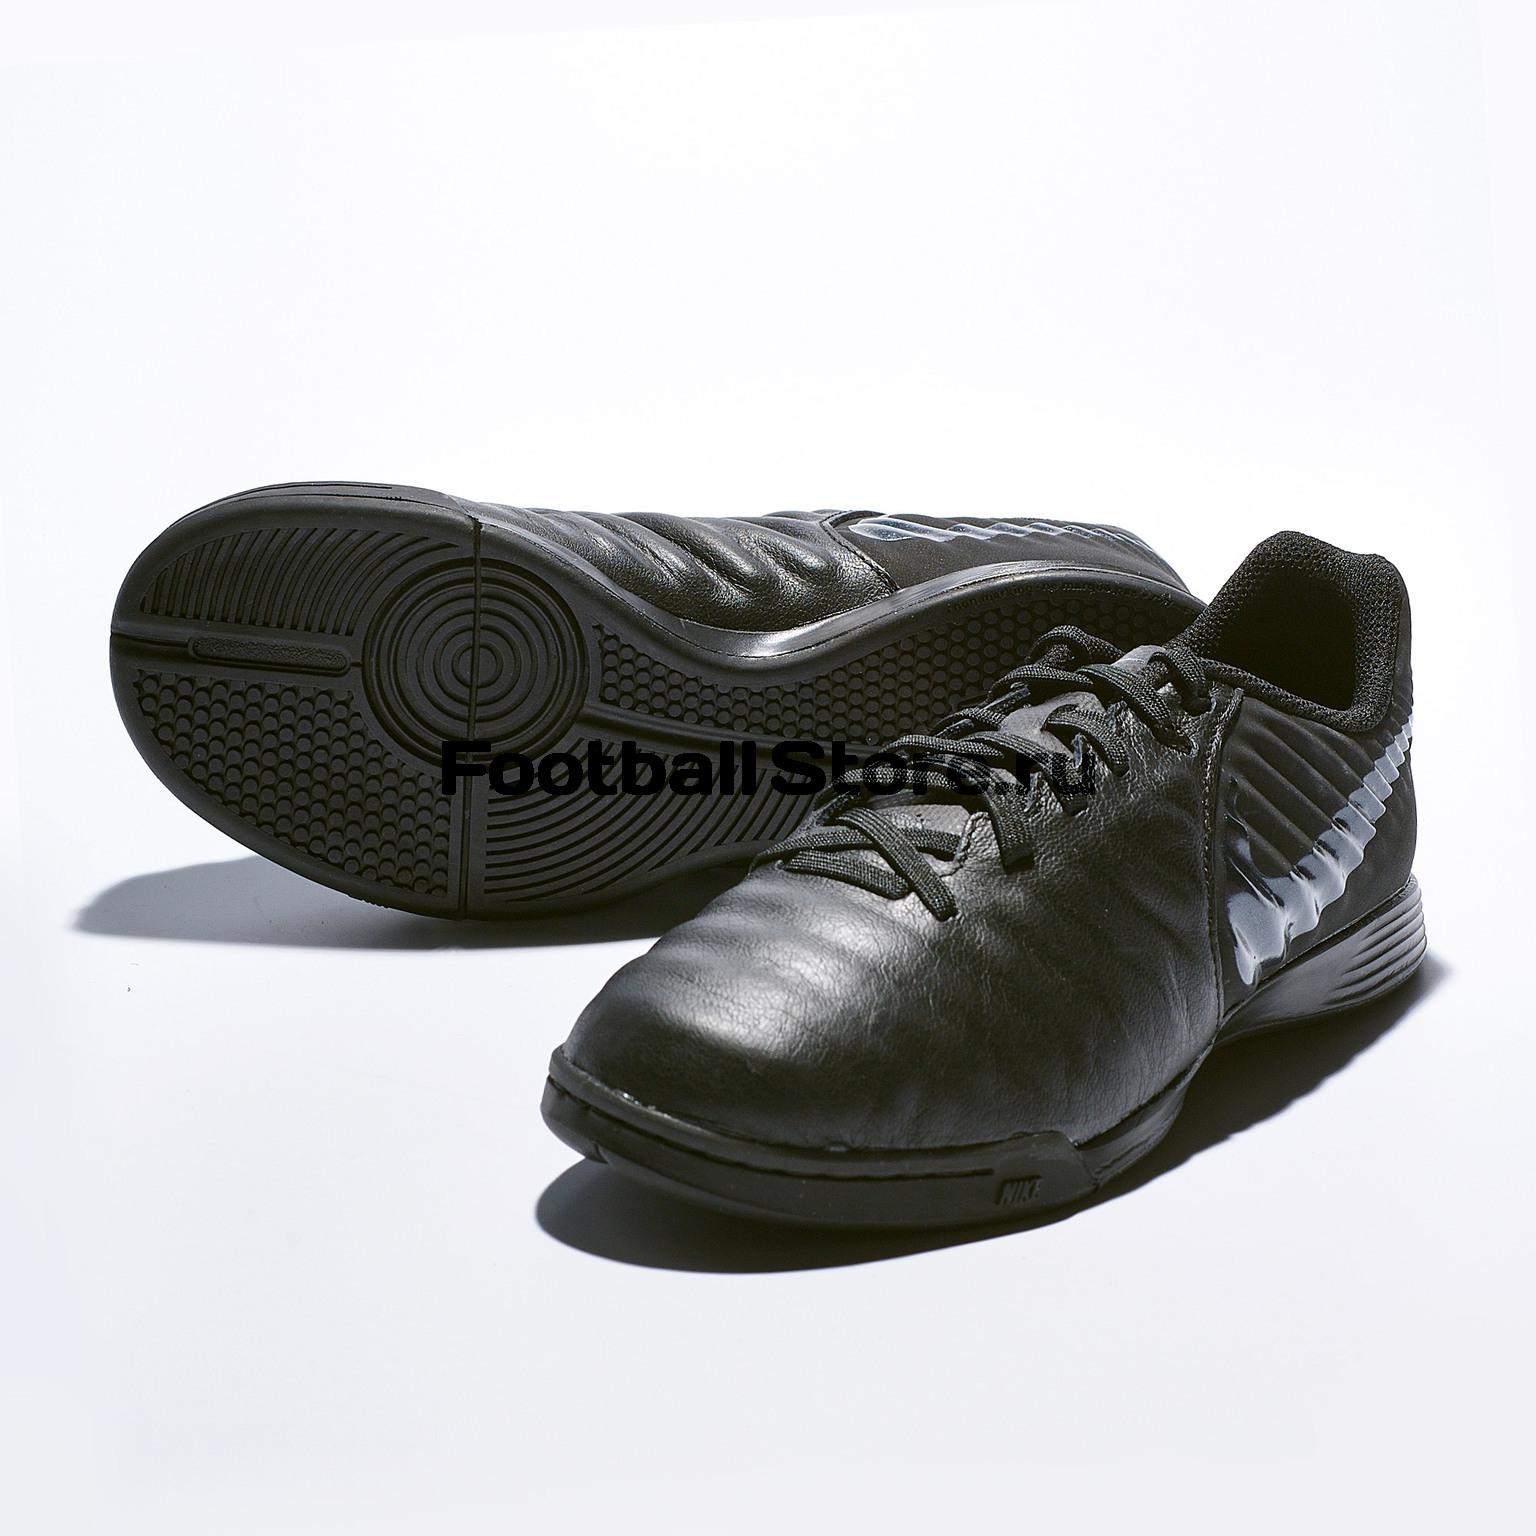 Футзалки детские Nike LegendX 7 Academy IC AH7257-001 цена